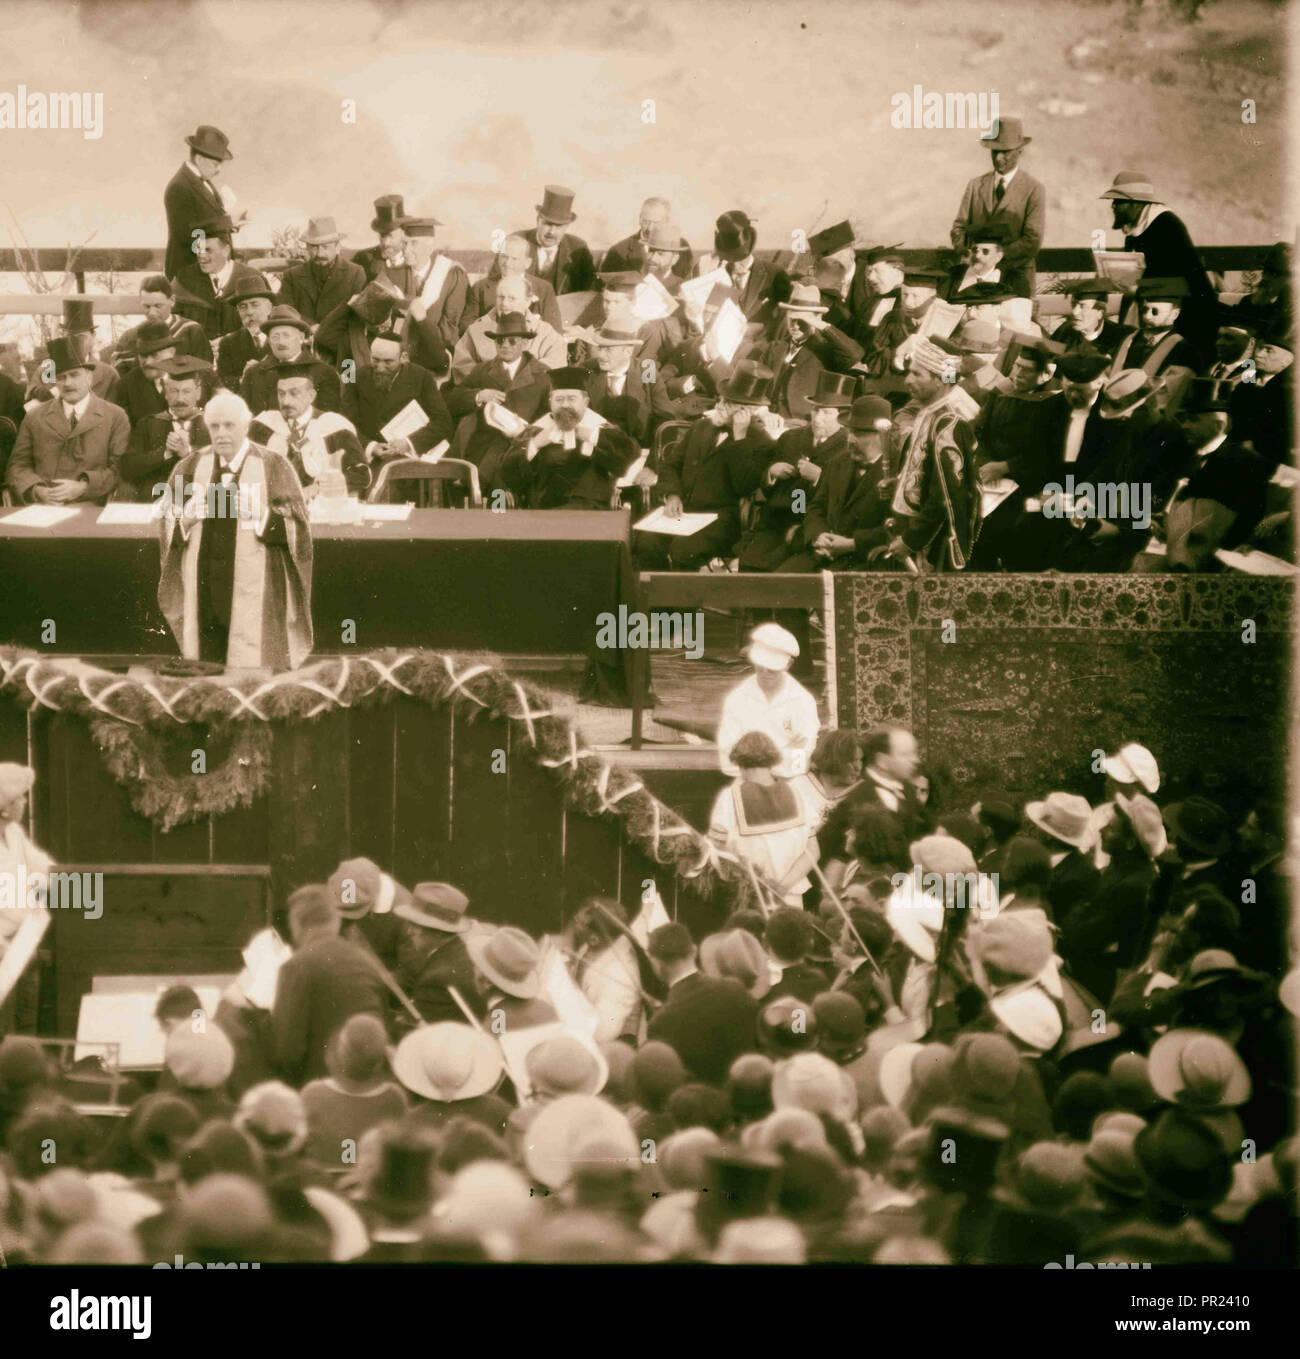 Opening of the Hebrew University 1925, Jerusalem, Israel - Stock Image